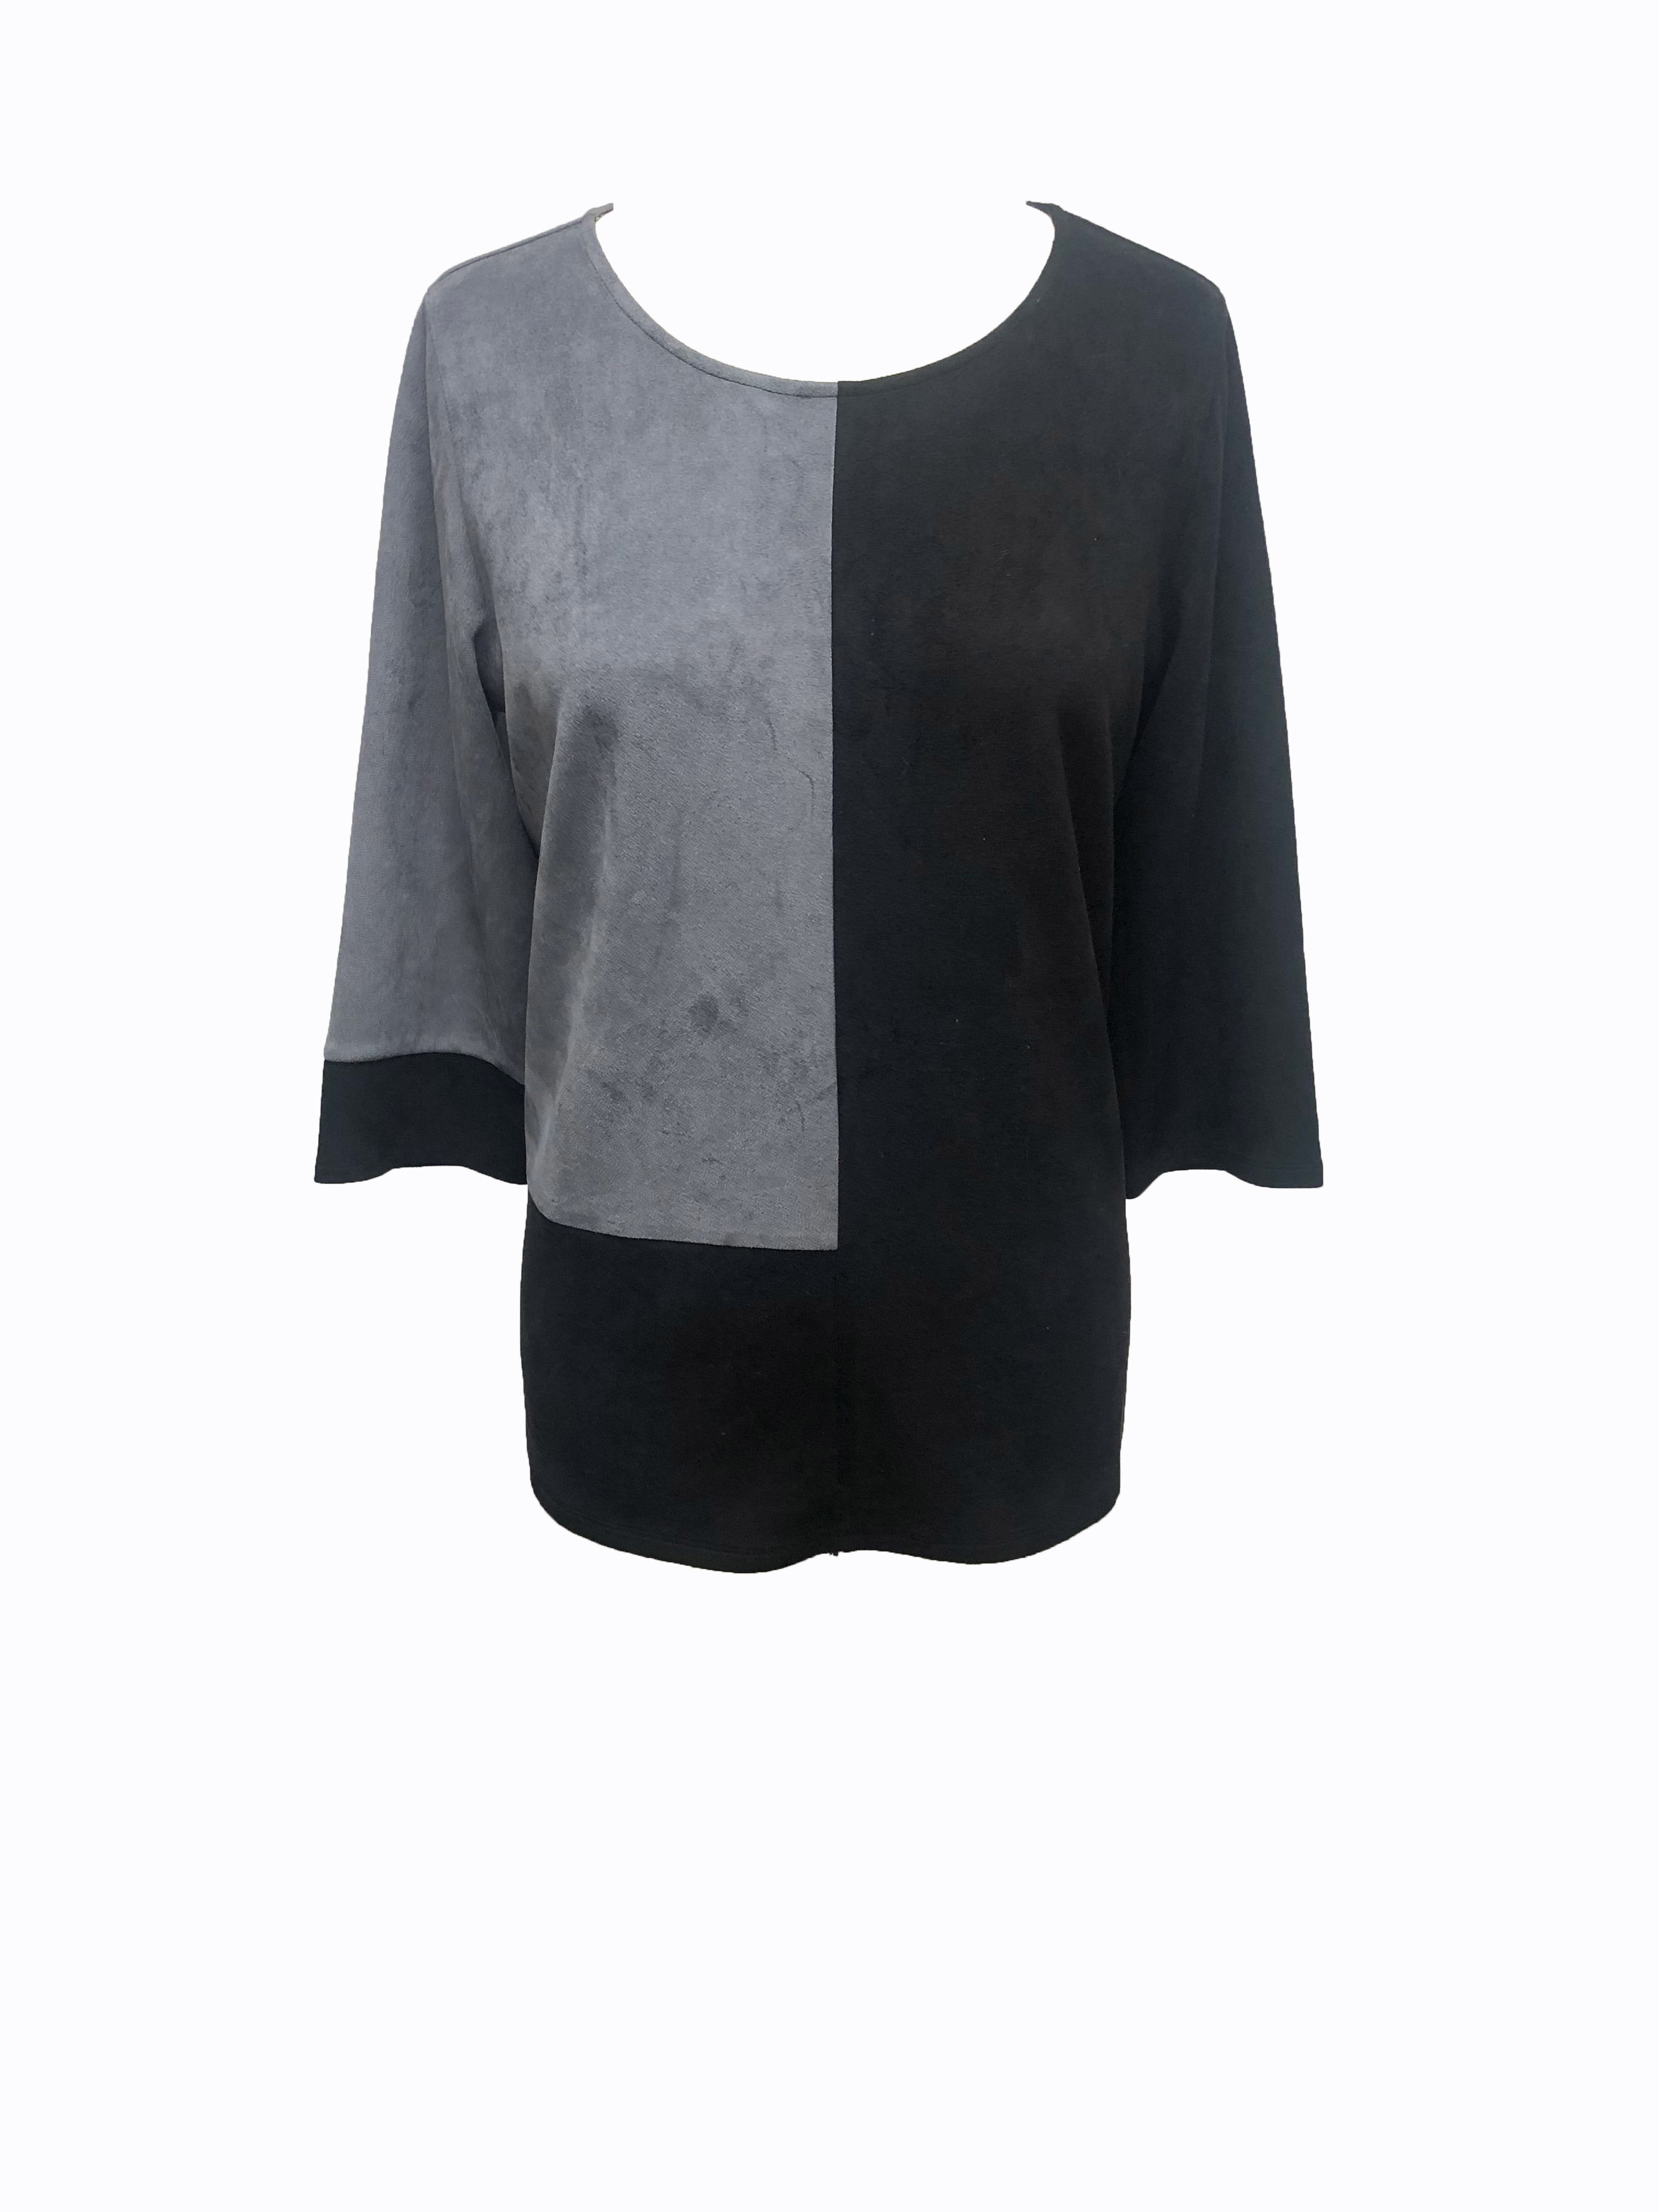 Alexa Top -Gray black - Front